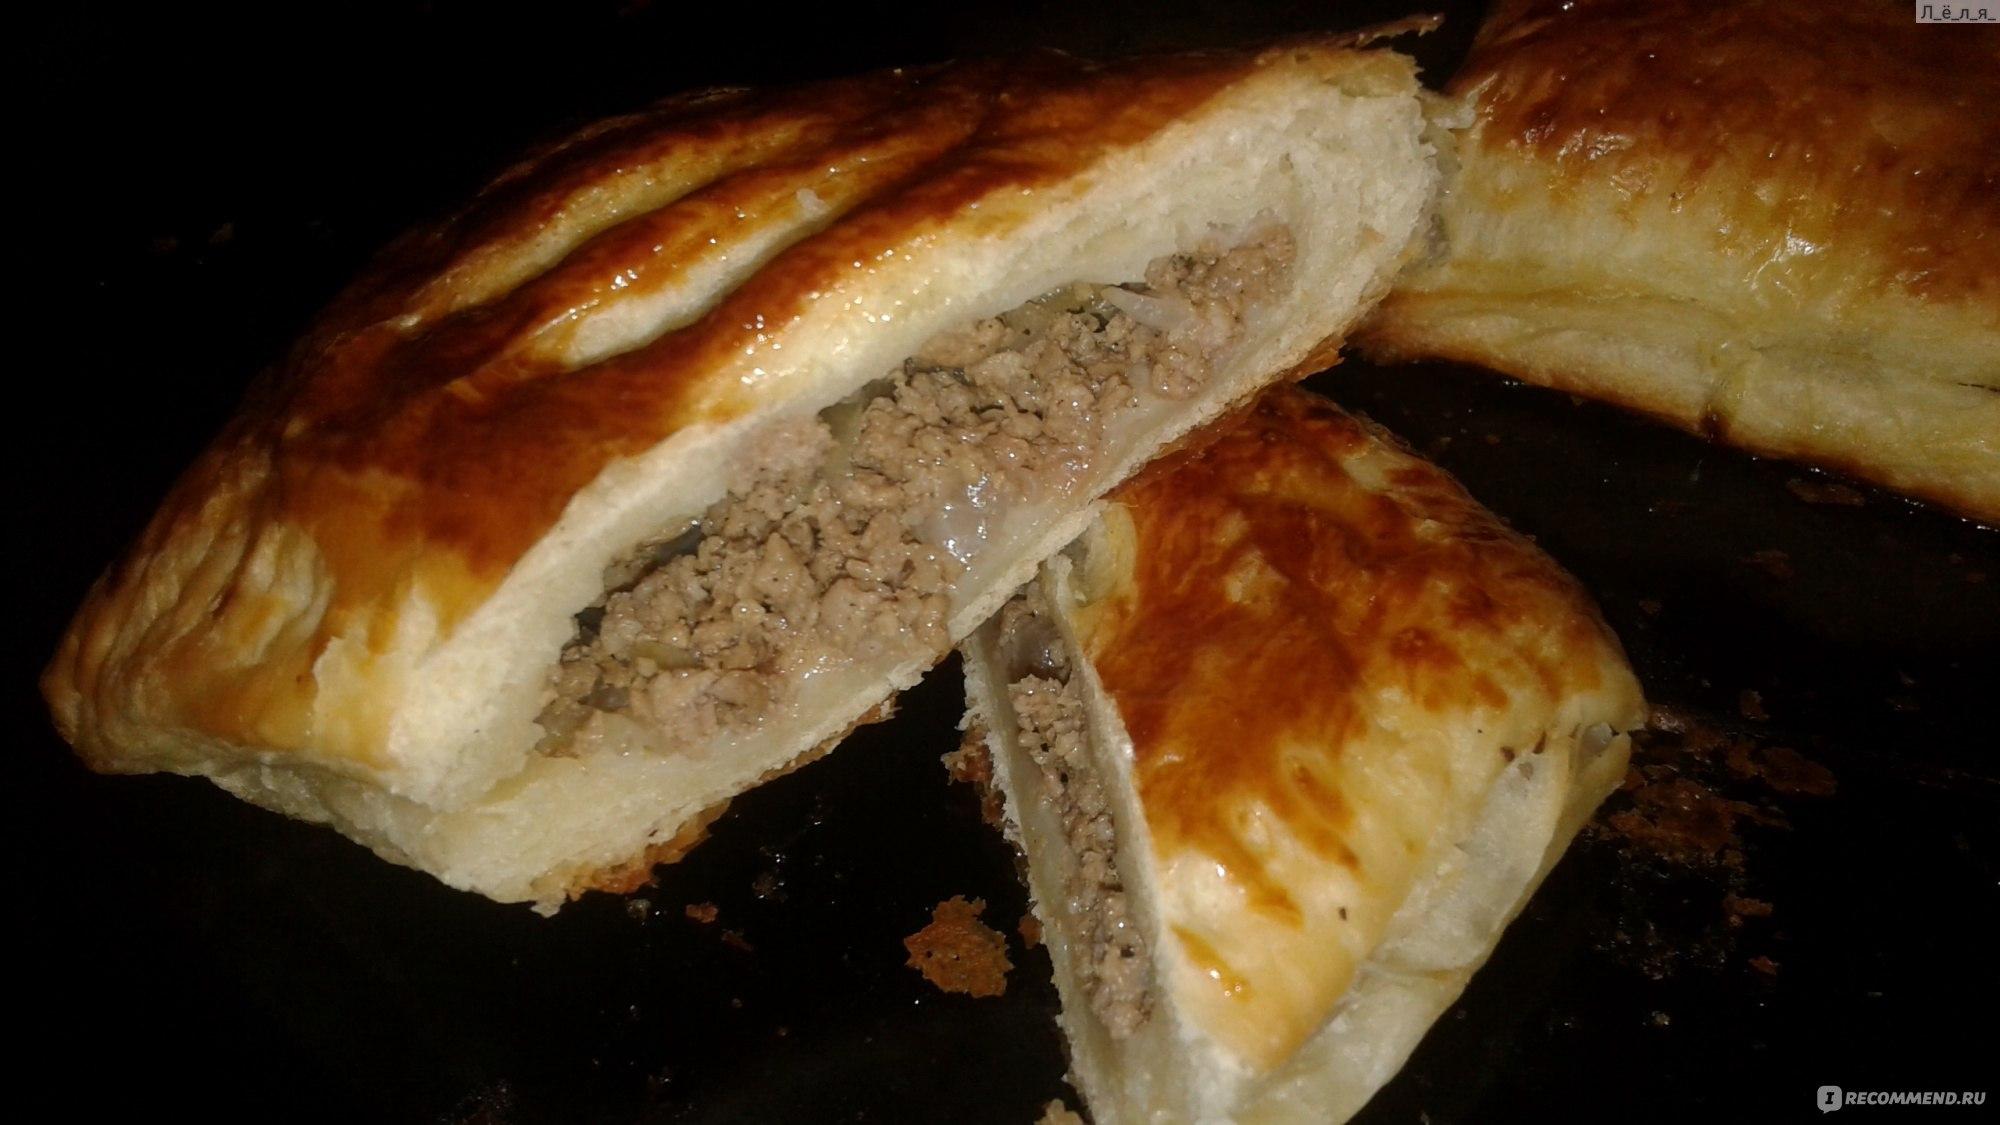 Пирог с фаршем на дрожжевом тесте в духовке рецепт пошагово